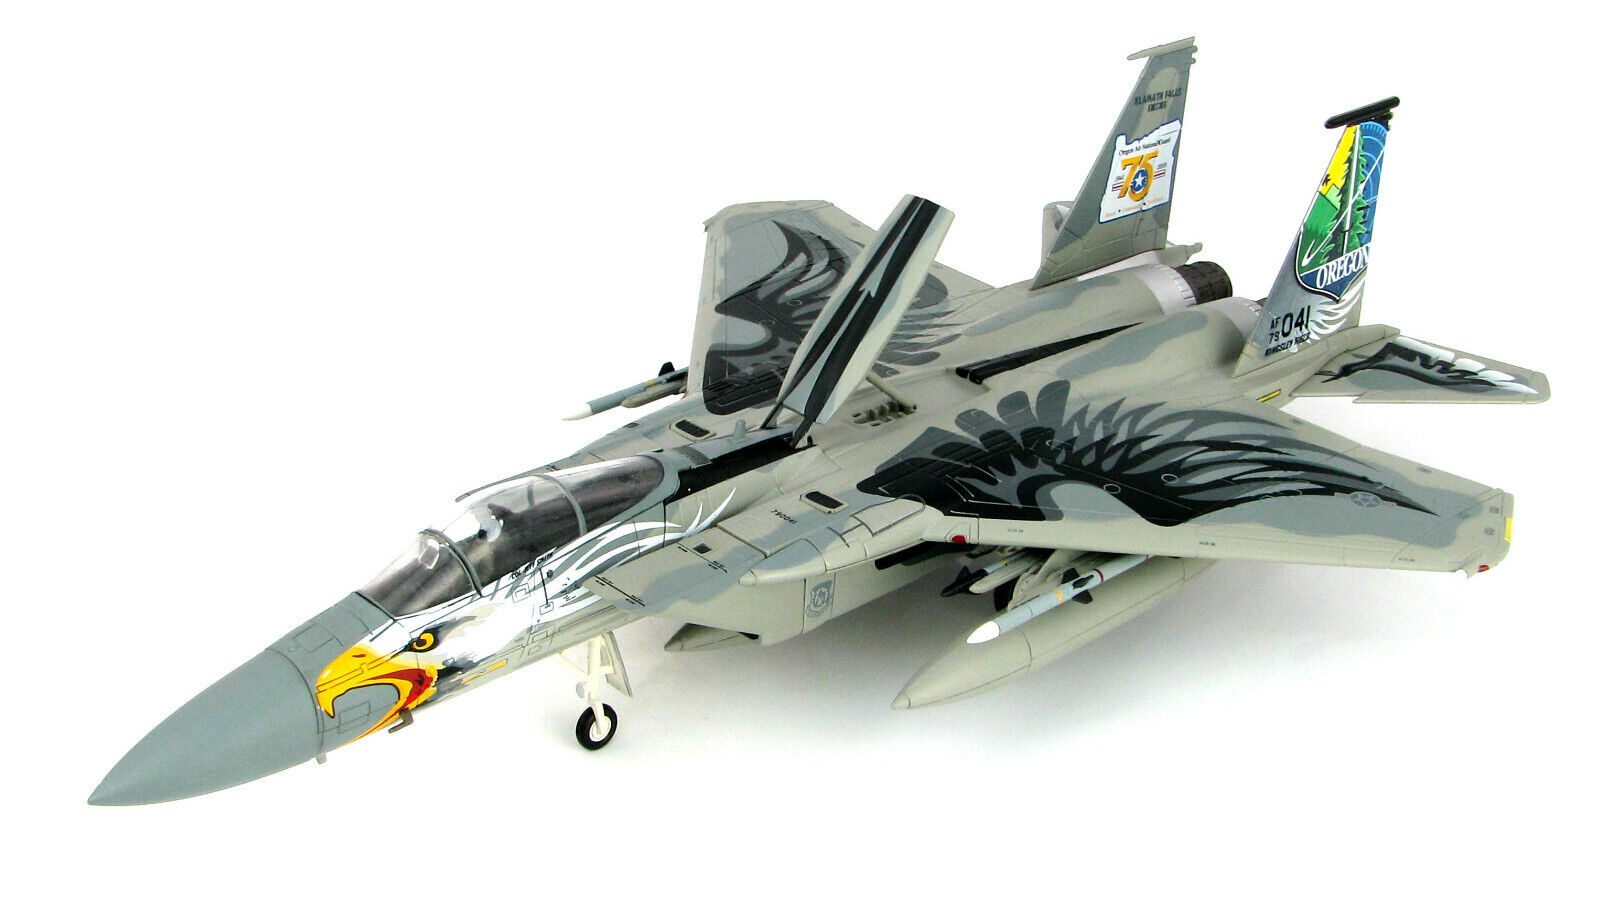 Hobby Master 1 72 USAF Boeing F-15C Eagle - Oregon ANG, 75th Anniversary, HA4559